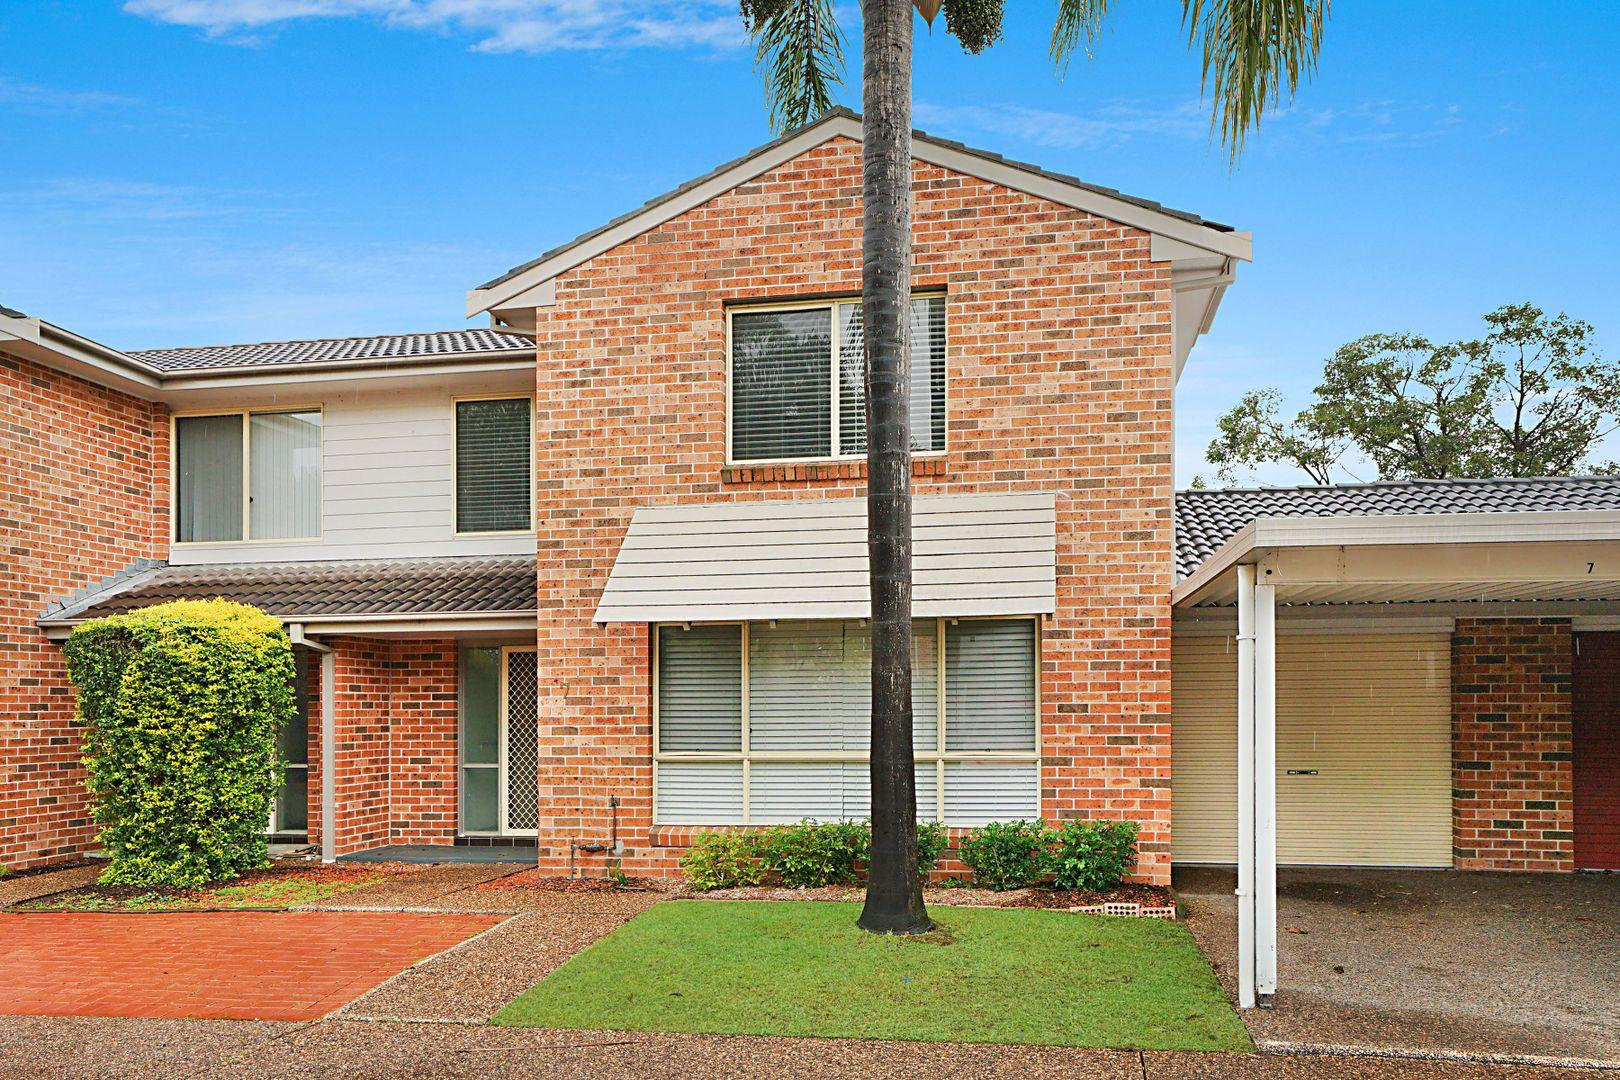 7/15 Hastings Drive, Raymond Terrace NSW 2324, Image 0